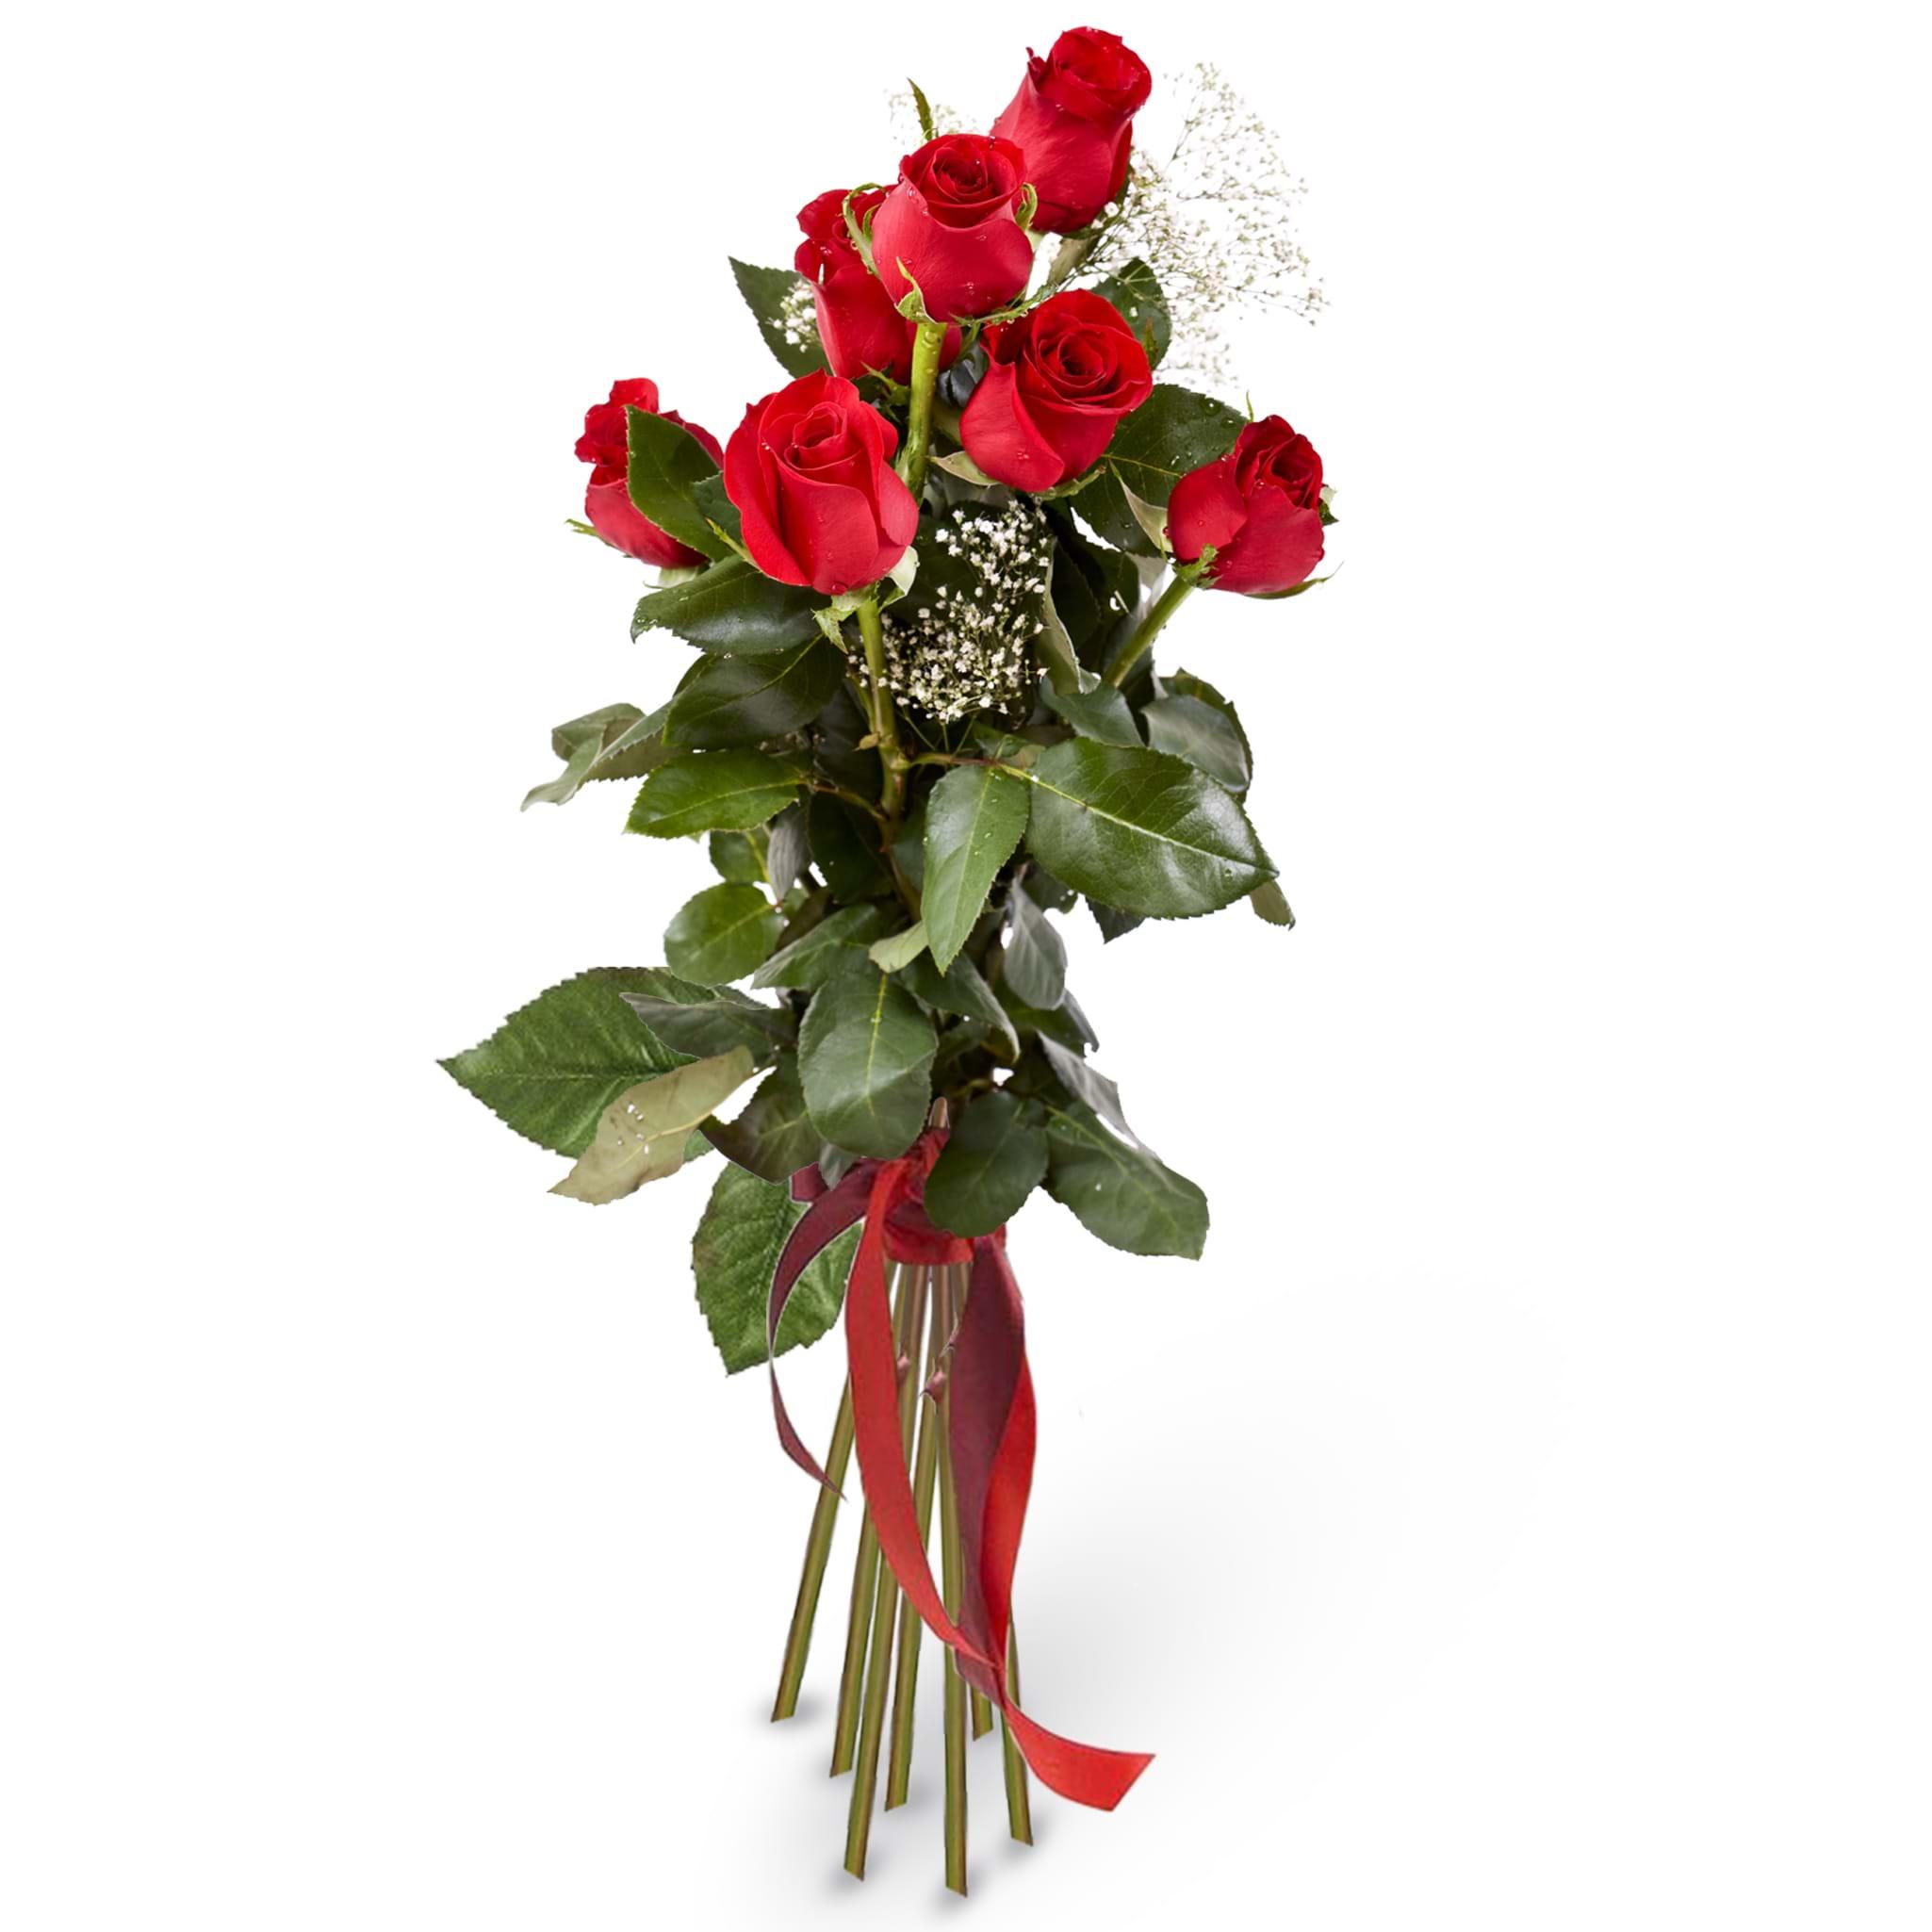 Spedire mazzo 7 rose rosse